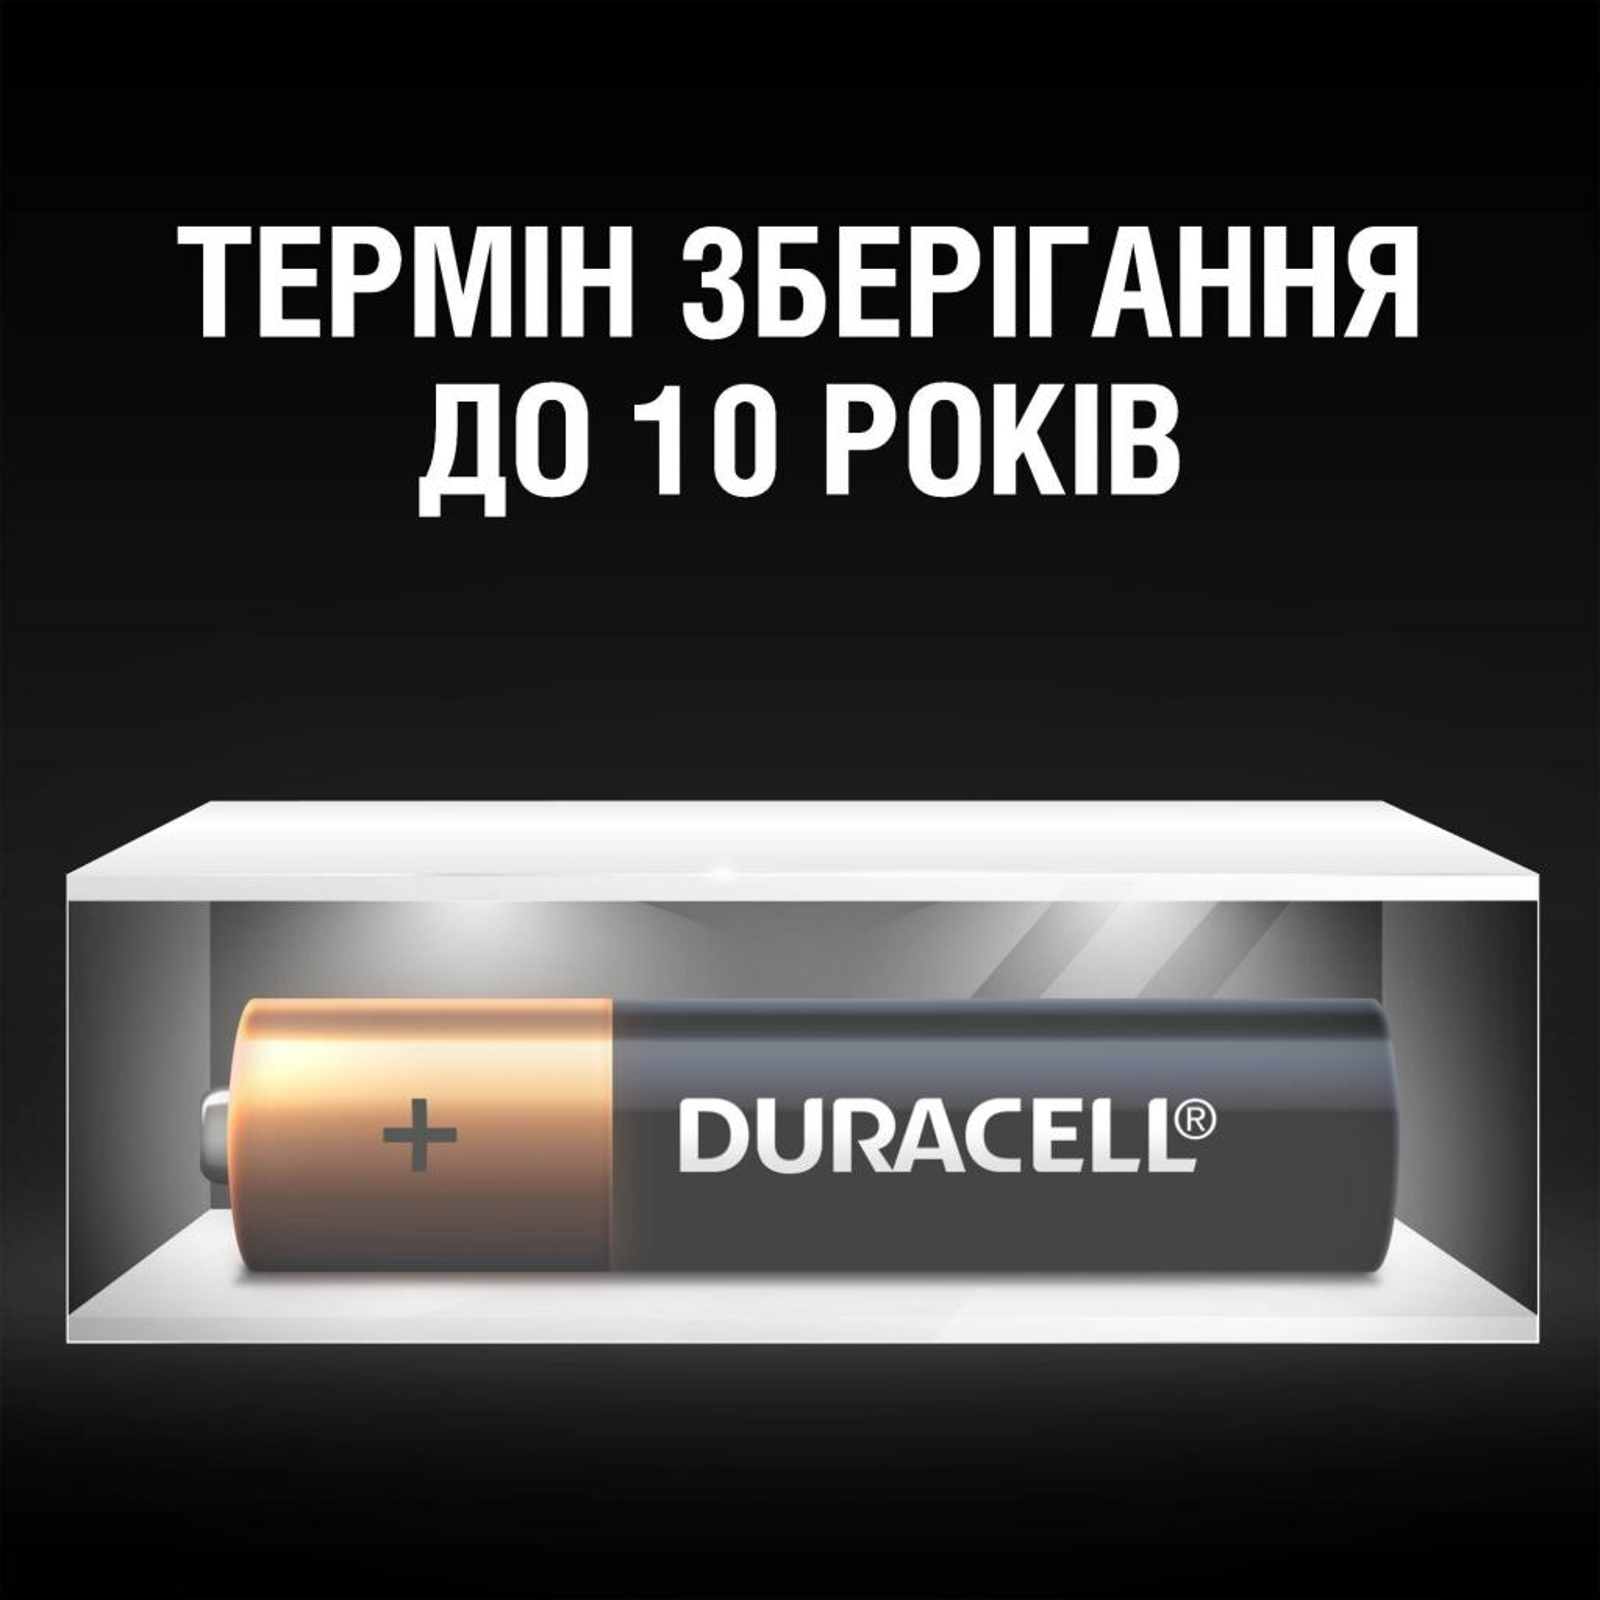 Батарейка AAA MN2400 LR03 * 4 Duracell (5000394052543 / 81545421) изображение 6